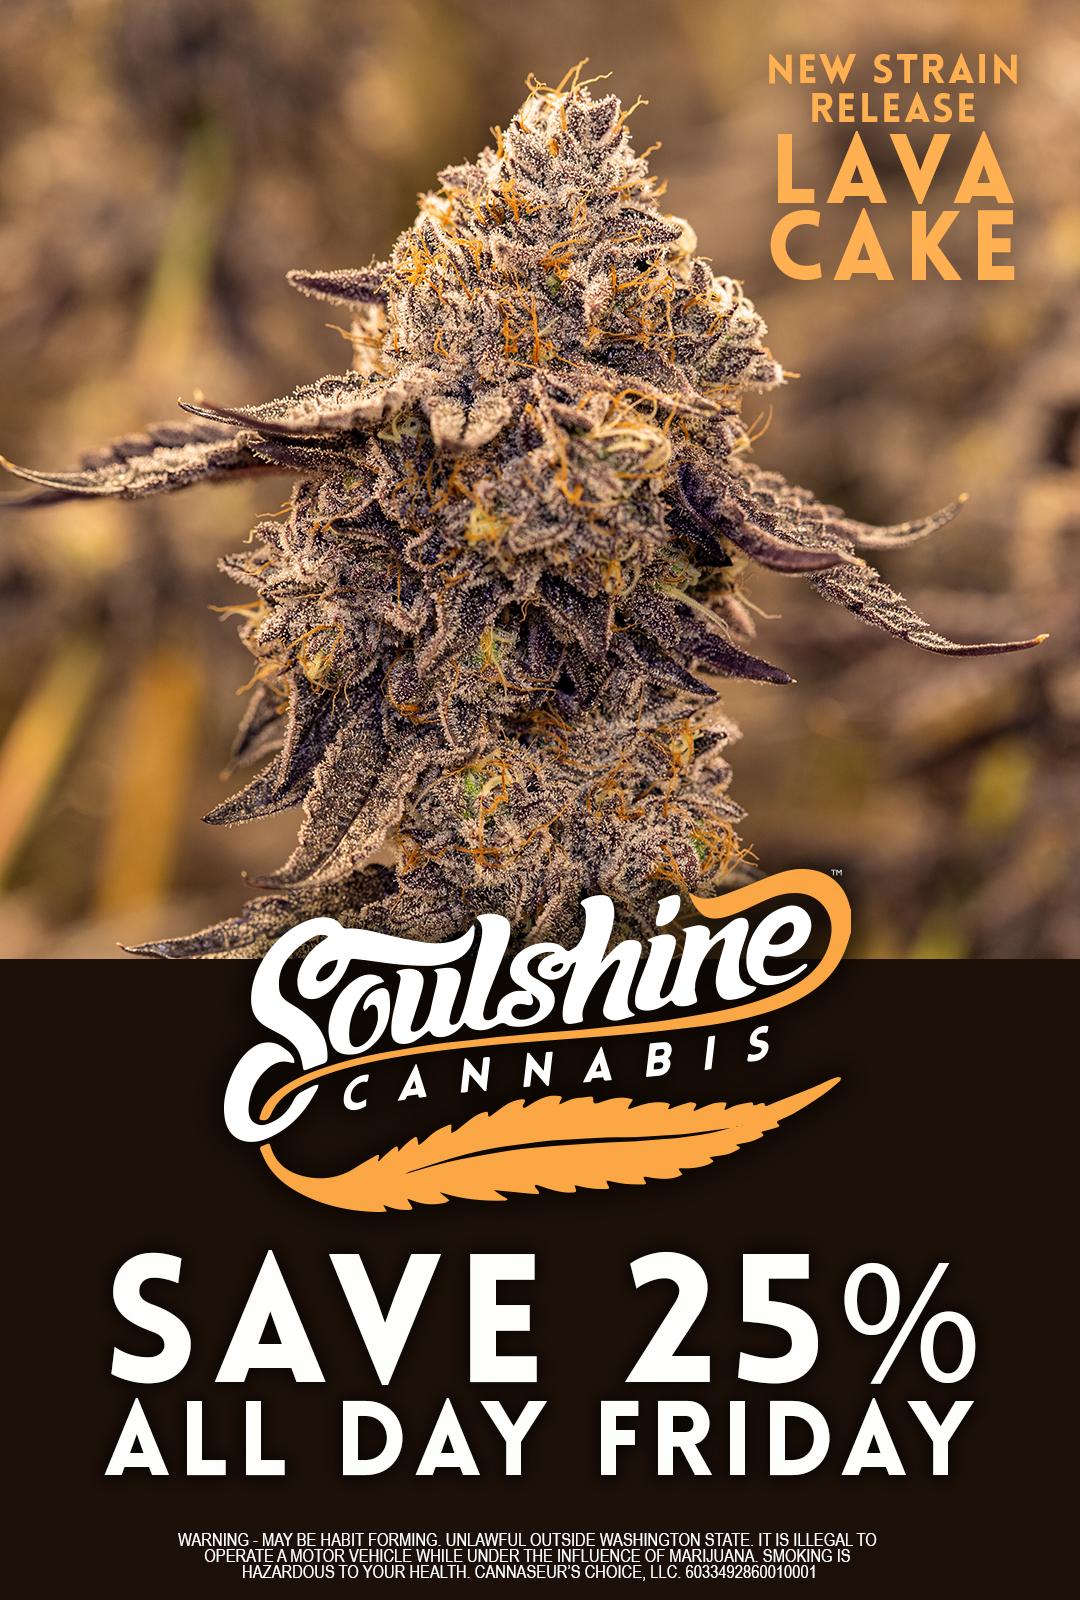 soulshine cannabis sale